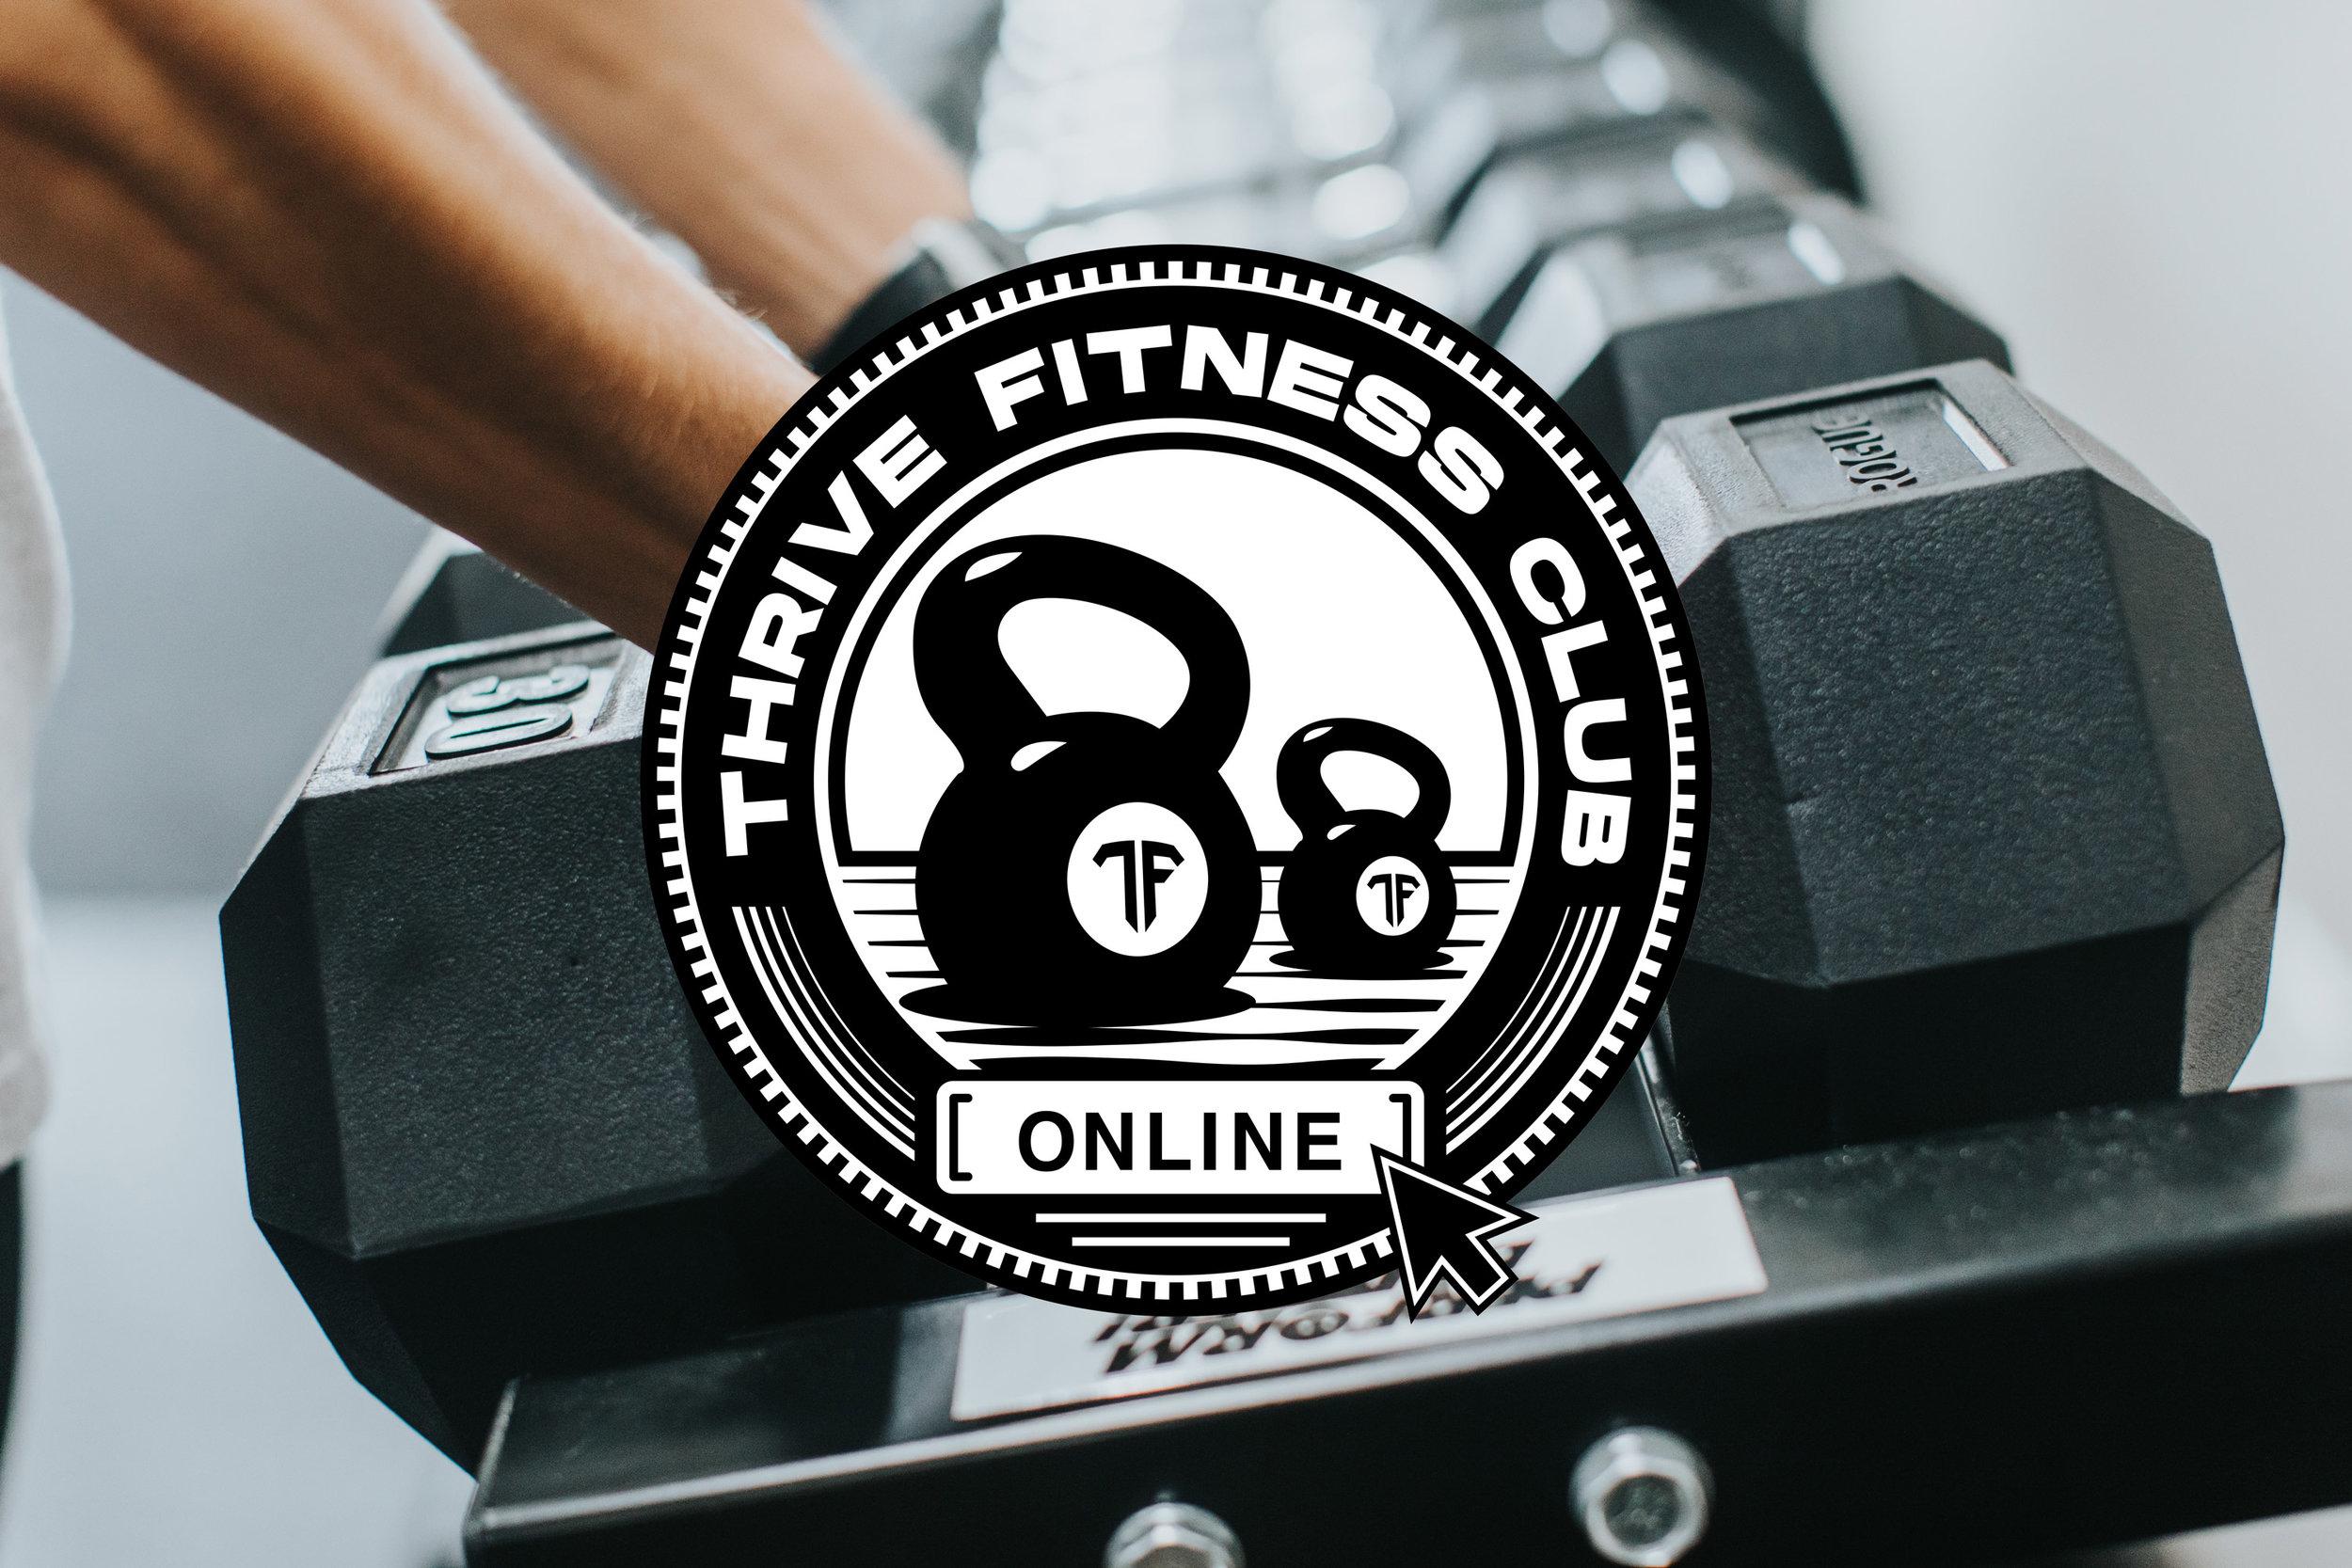 TCF_Online.jpg